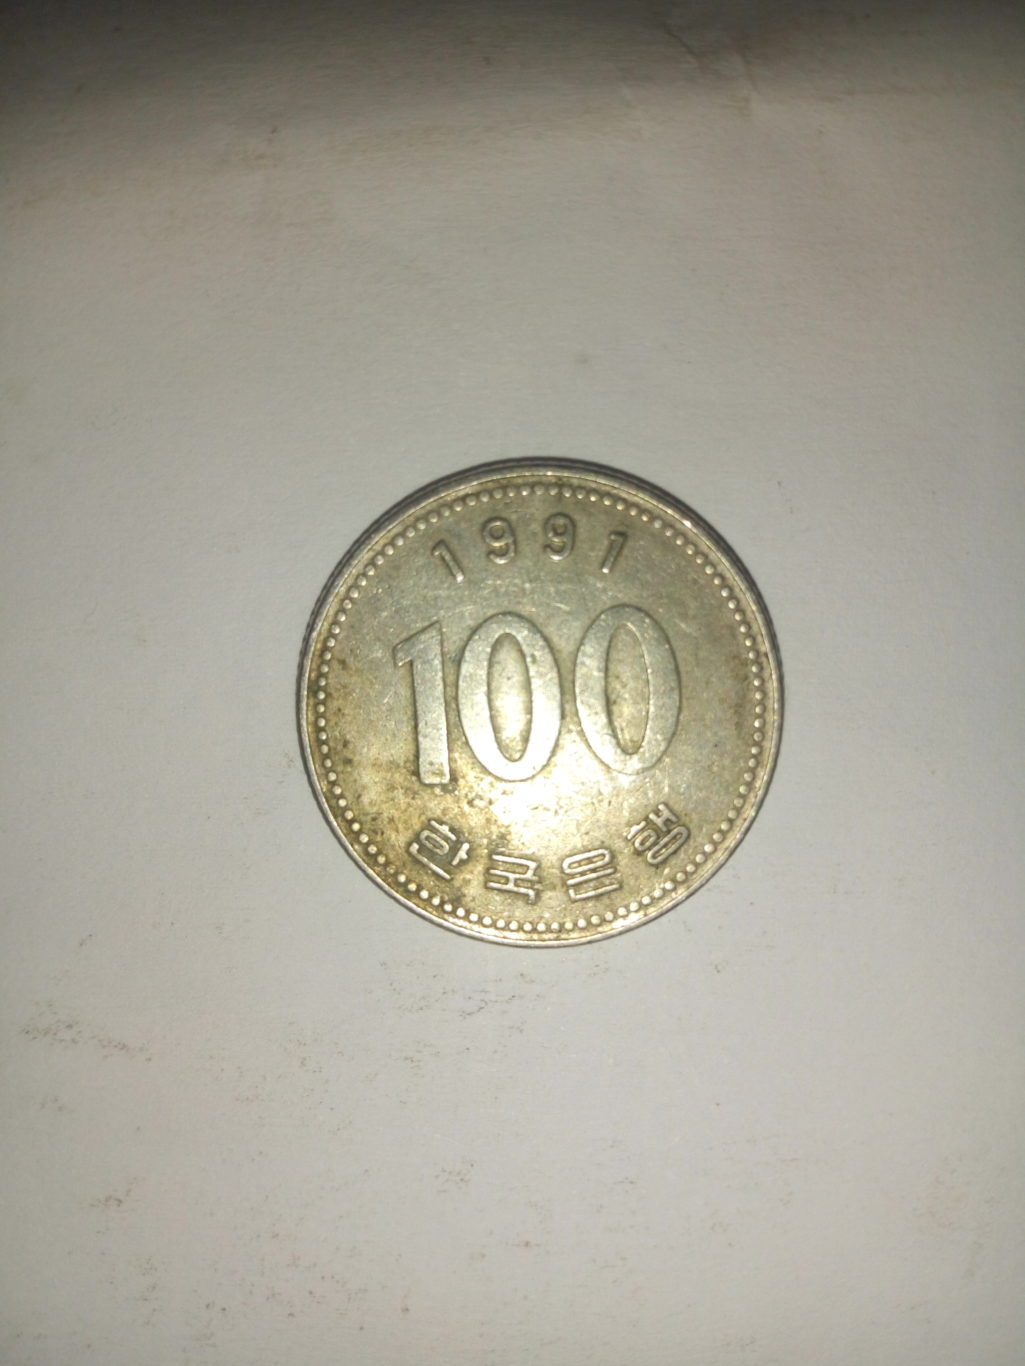 1991_100